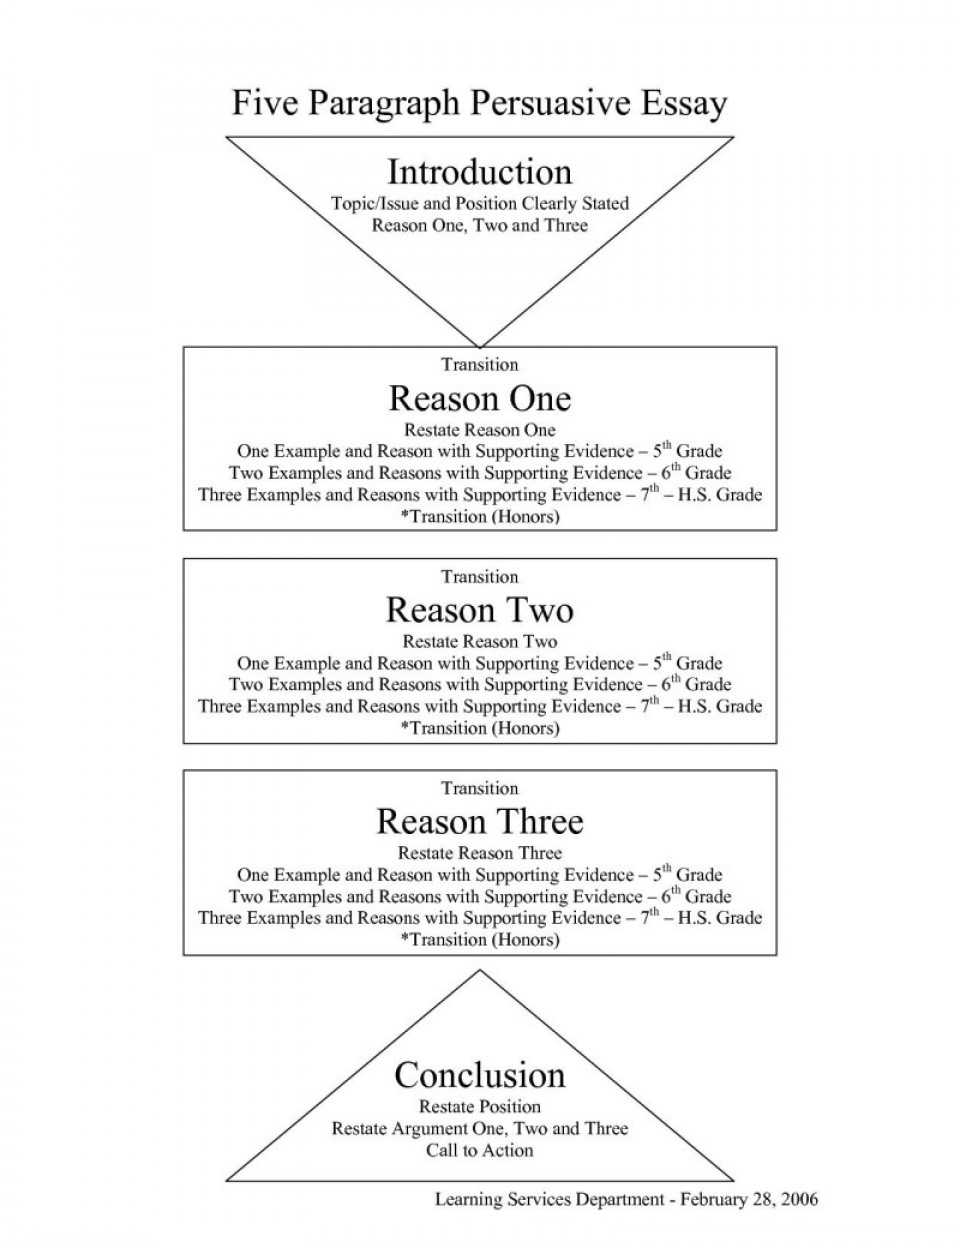 011 Essay Example Conclusion Transitions For Argumentative Essays Poemsrom Co Paragraph Structure Outline Persuasive Intro Good Argument Outstanding Pdf Prezi Nat 5 960